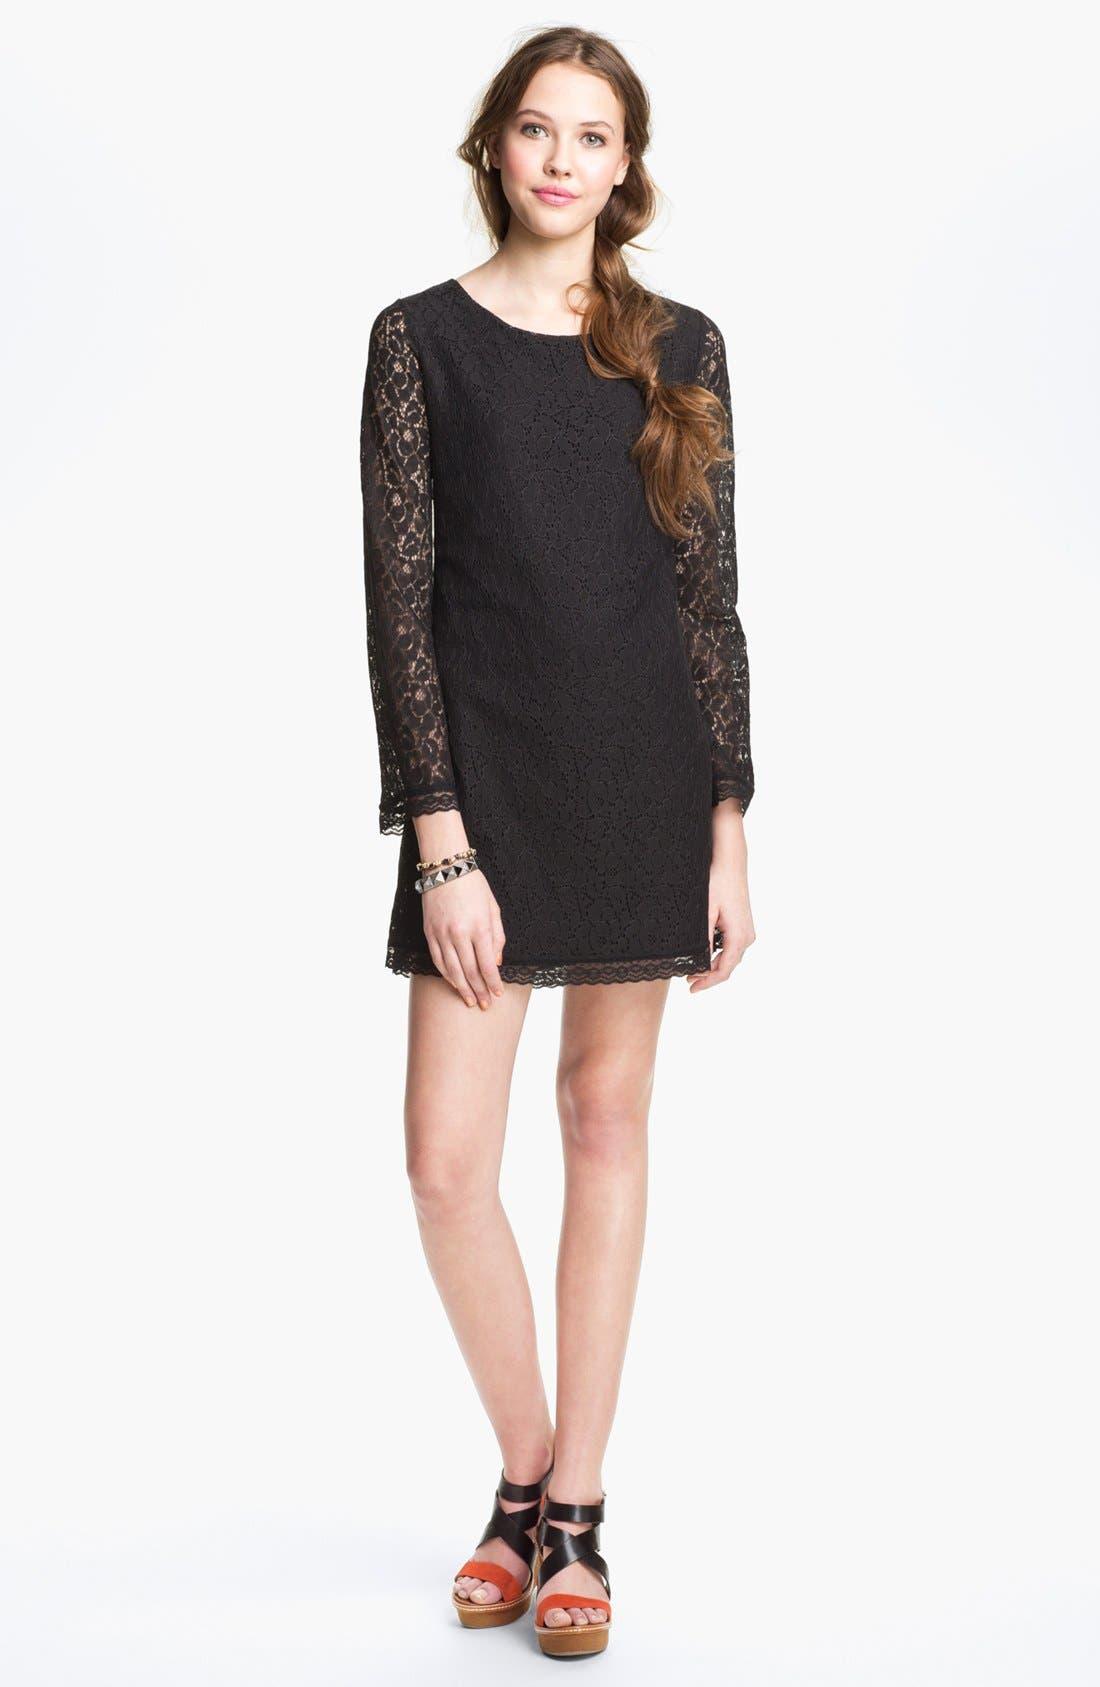 HIDDEN HEART Lace Shift Dress, Main, color, 001